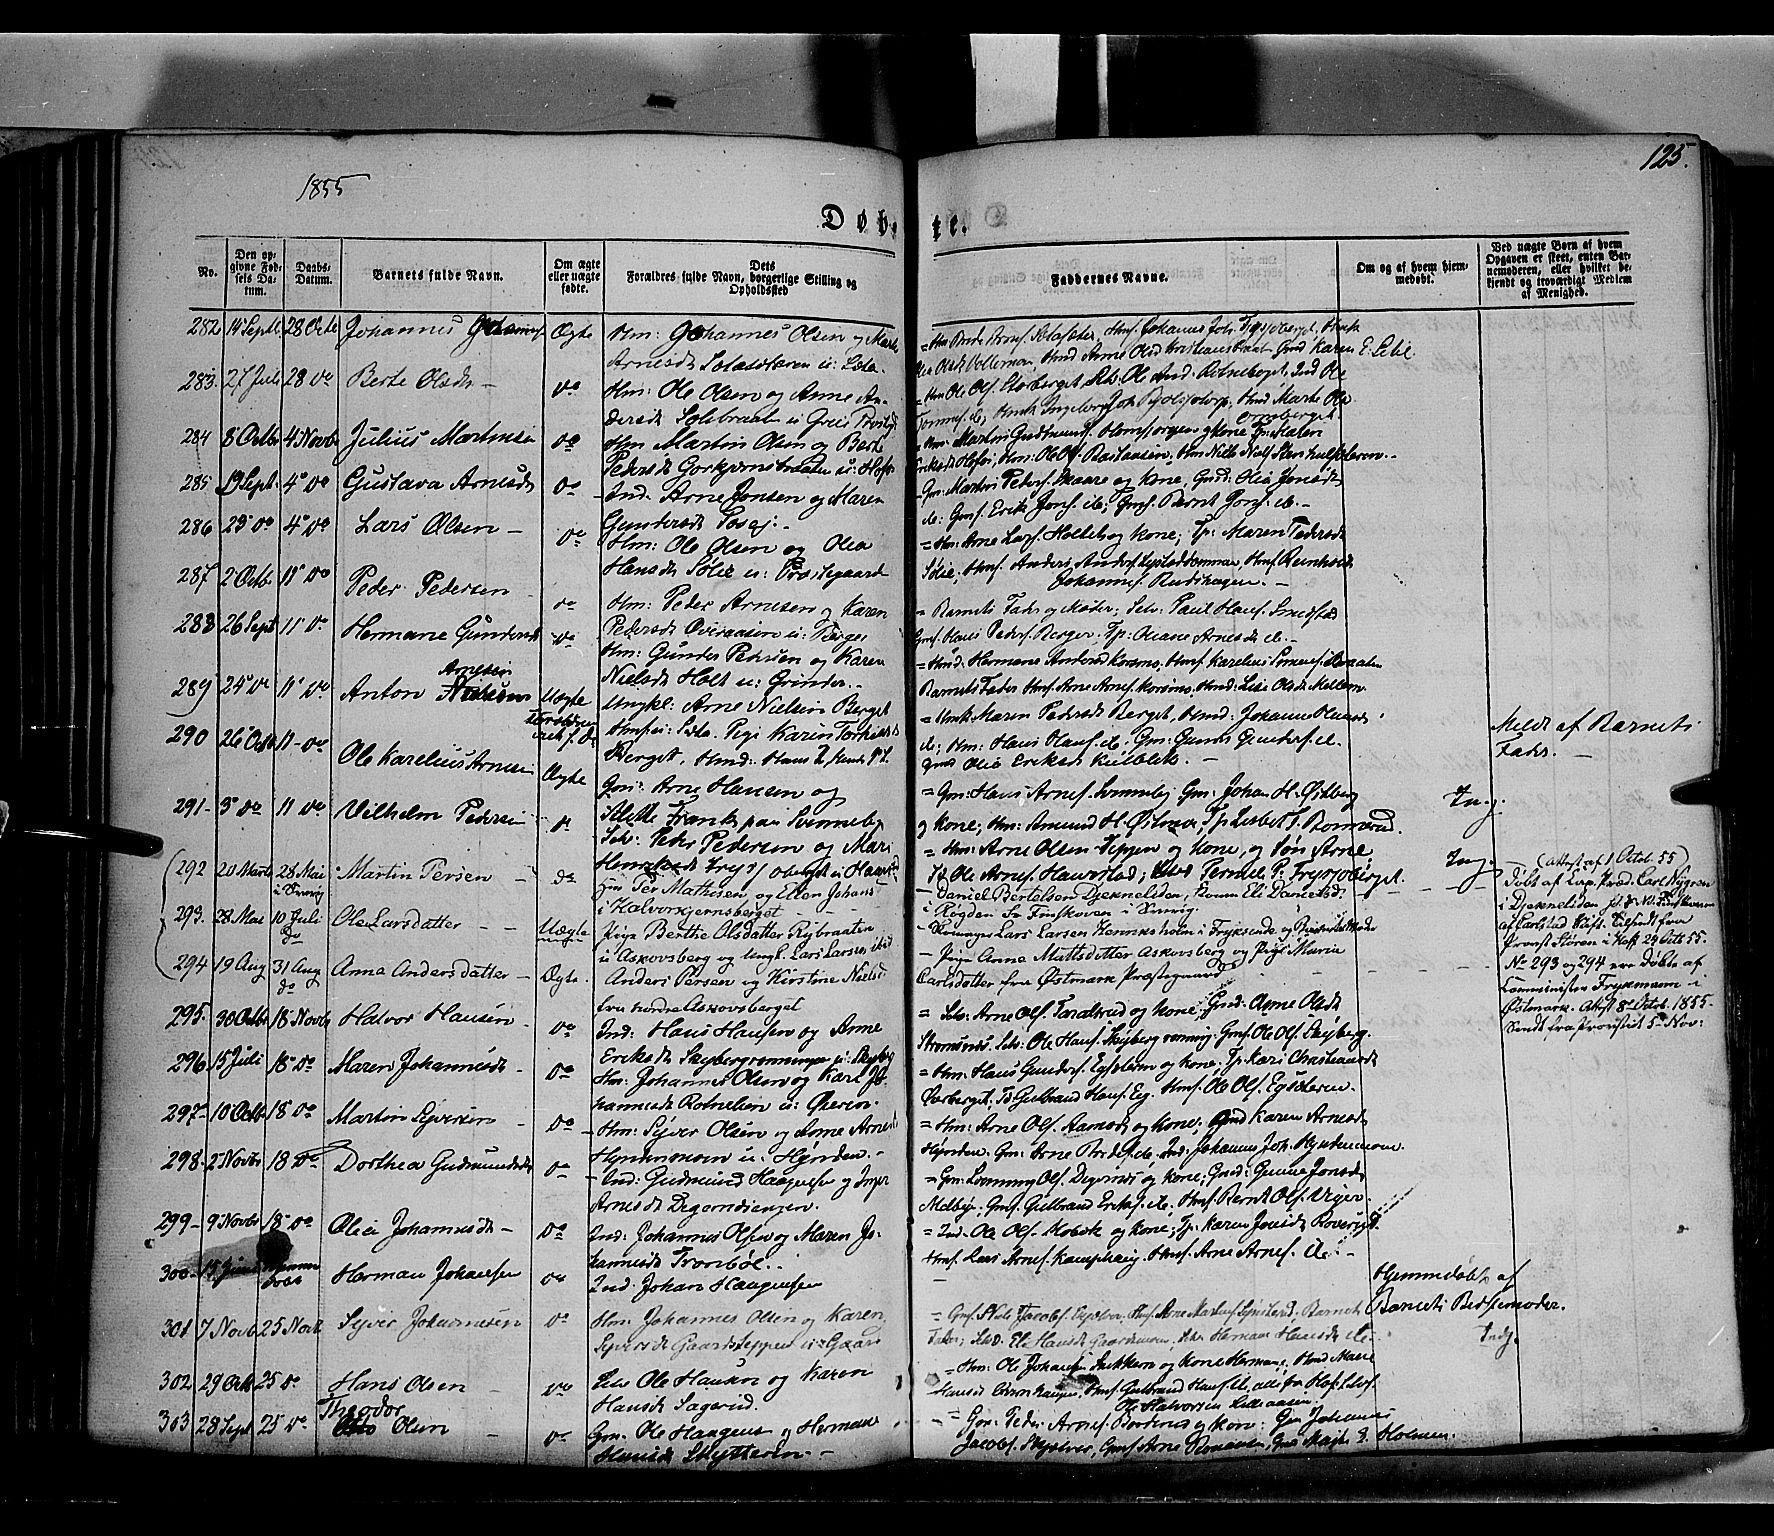 SAH, Grue prestekontor, Ministerialbok nr. 8, 1847-1858, s. 125